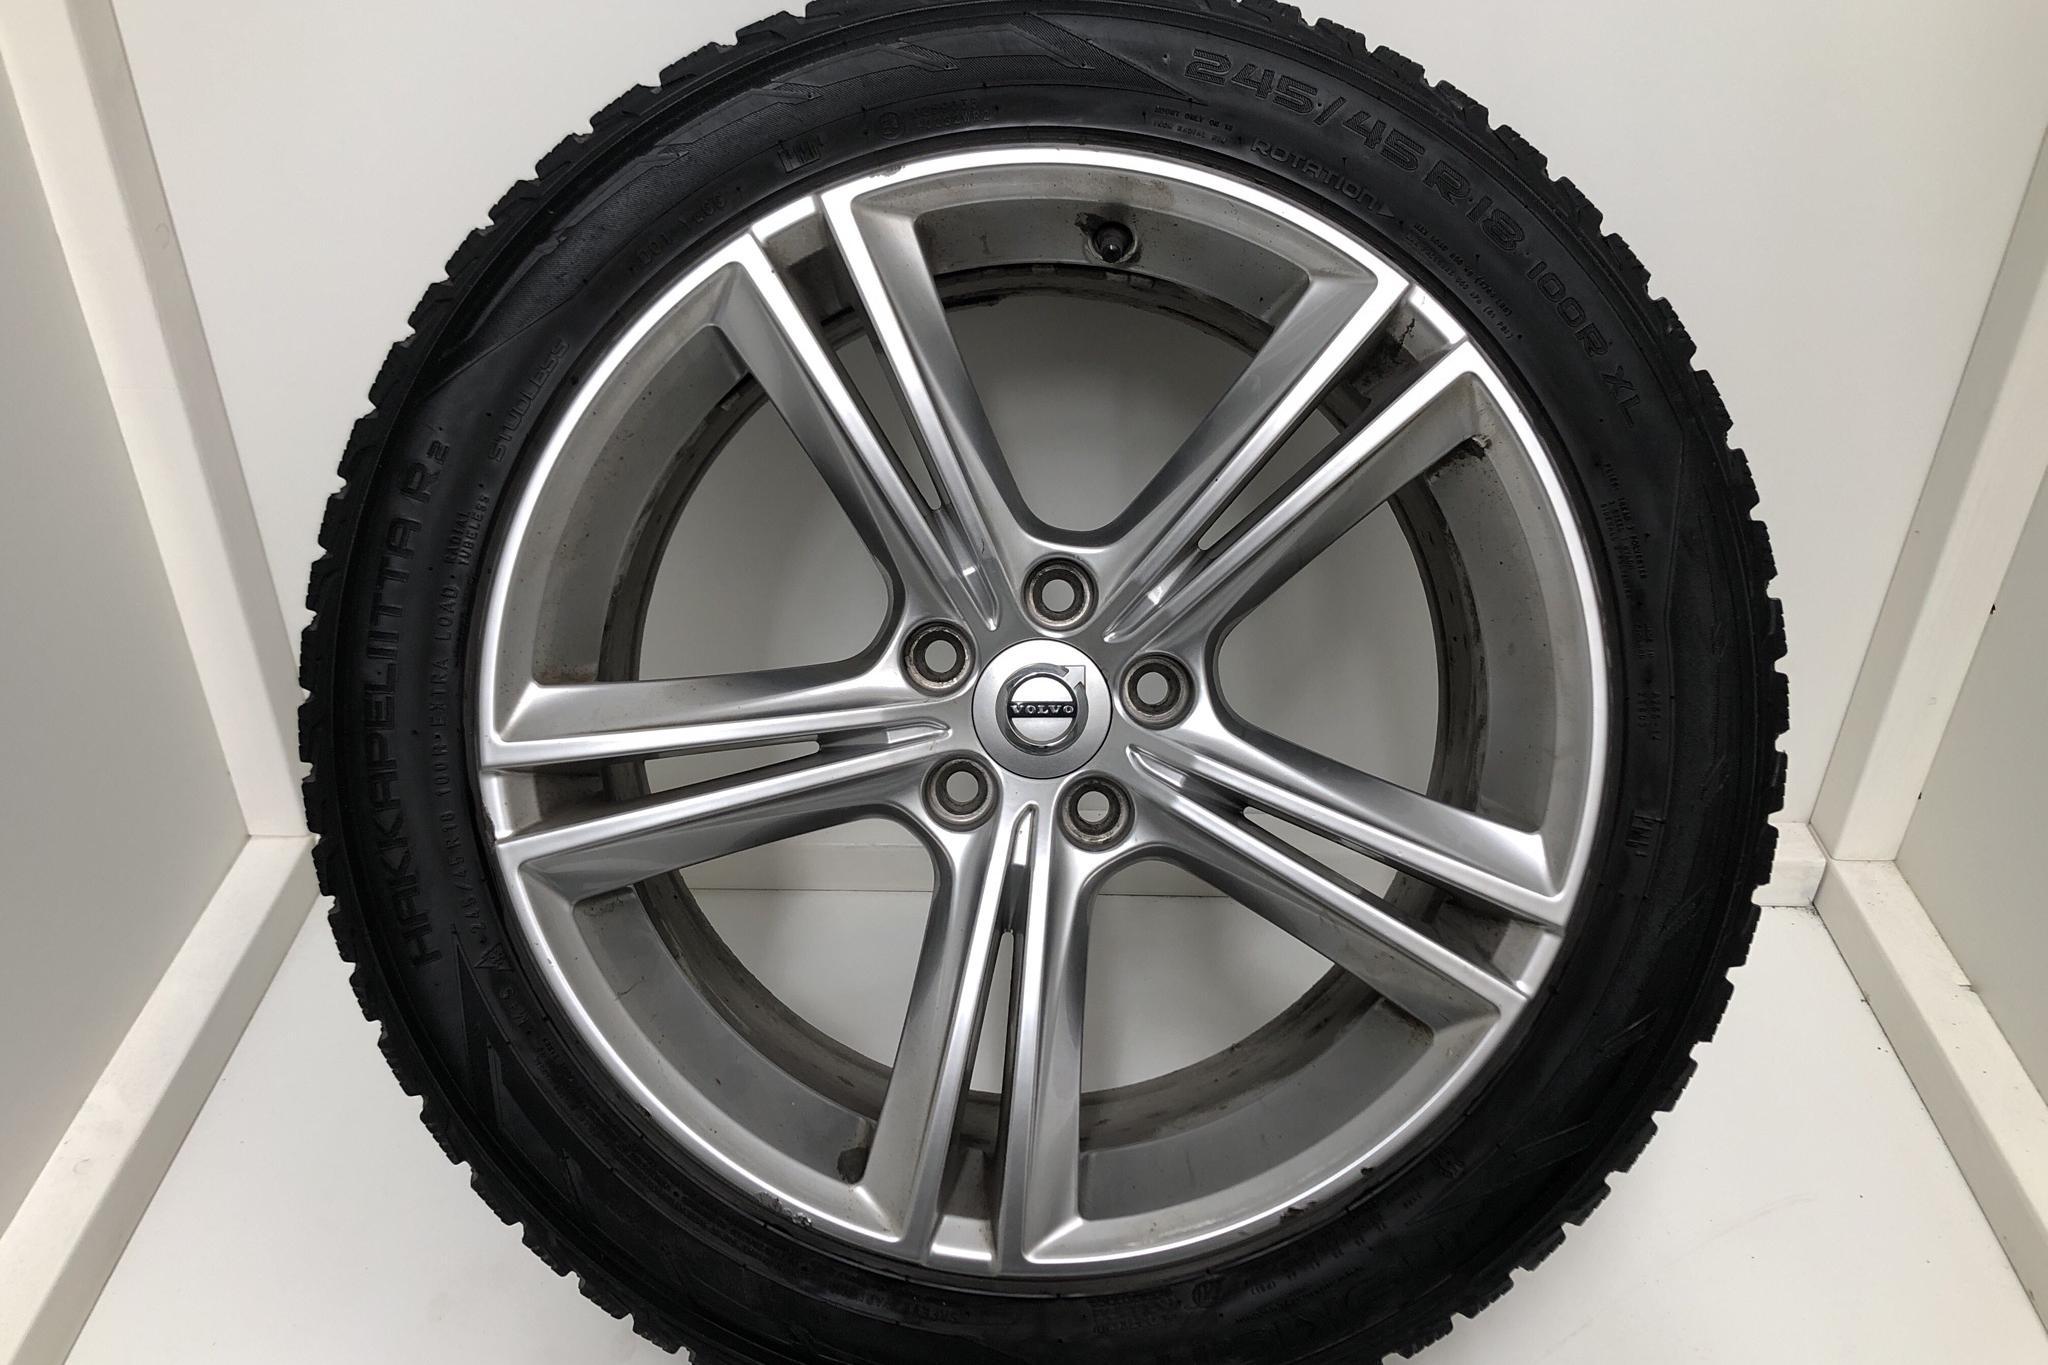 Volvo V90 D5 AWD (235hk) - 6 029 mil - Automat - svart - 2017